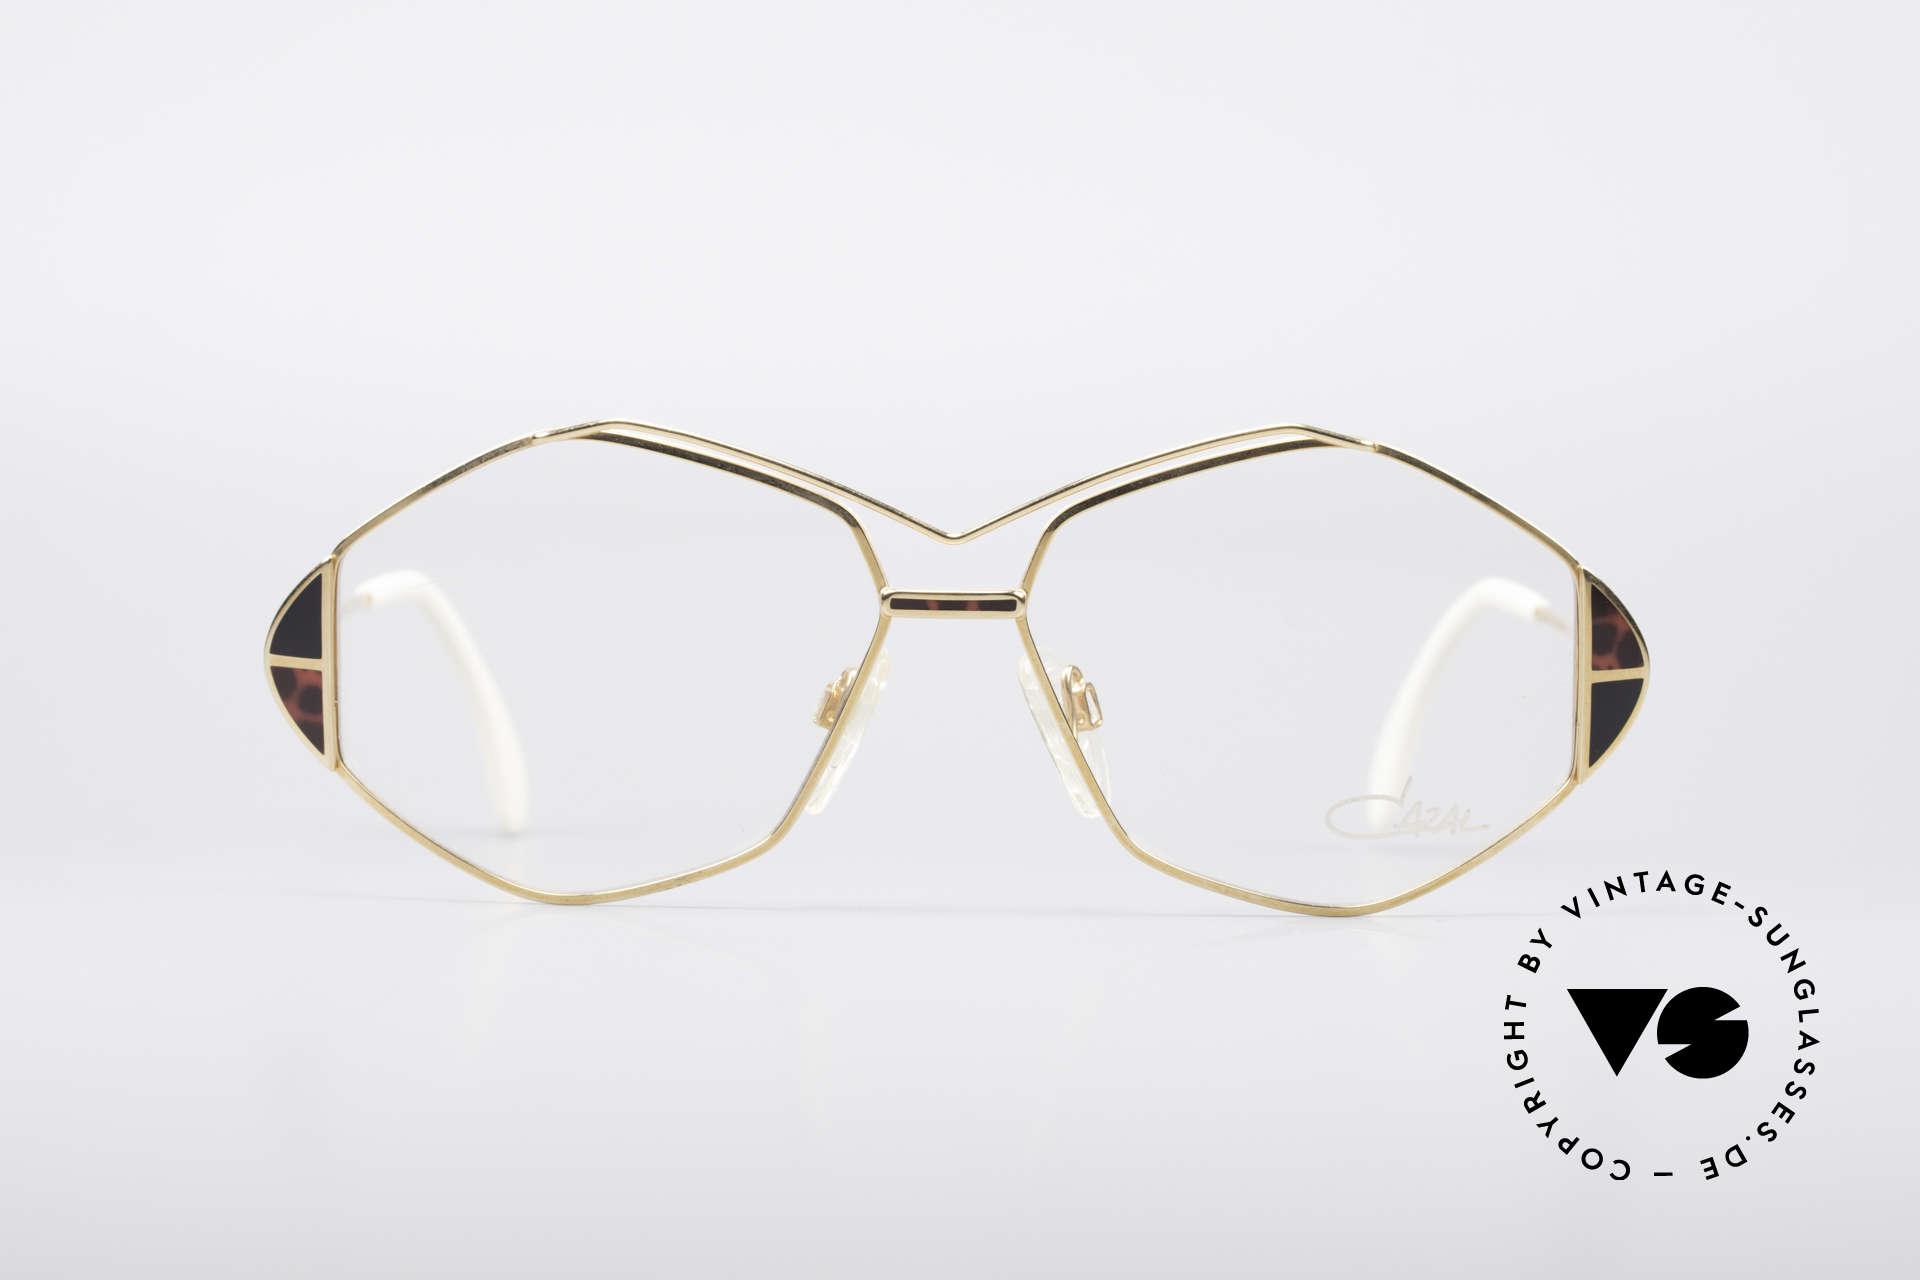 Cazal 233 True Vintage No Retro Specs, true vintage 'W.Germany'-Original, M size 57/14, Made for Women